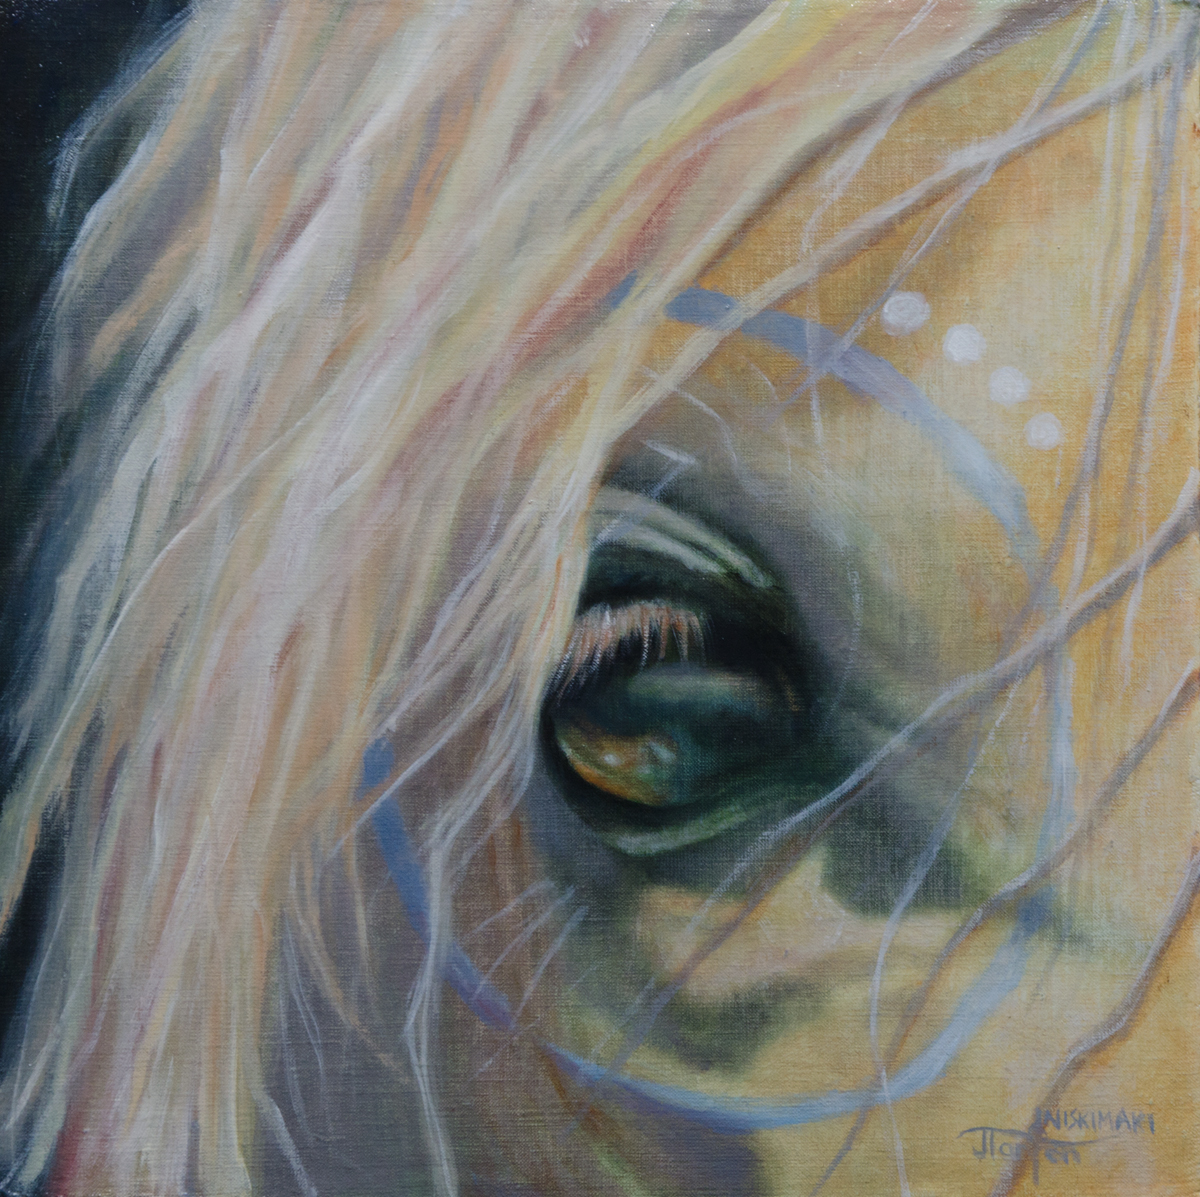 """Ponokamitaa - Heals The Soul"" ©2014 Janice Tanton. Oil on linen panel. 12""x12"" plus frame."